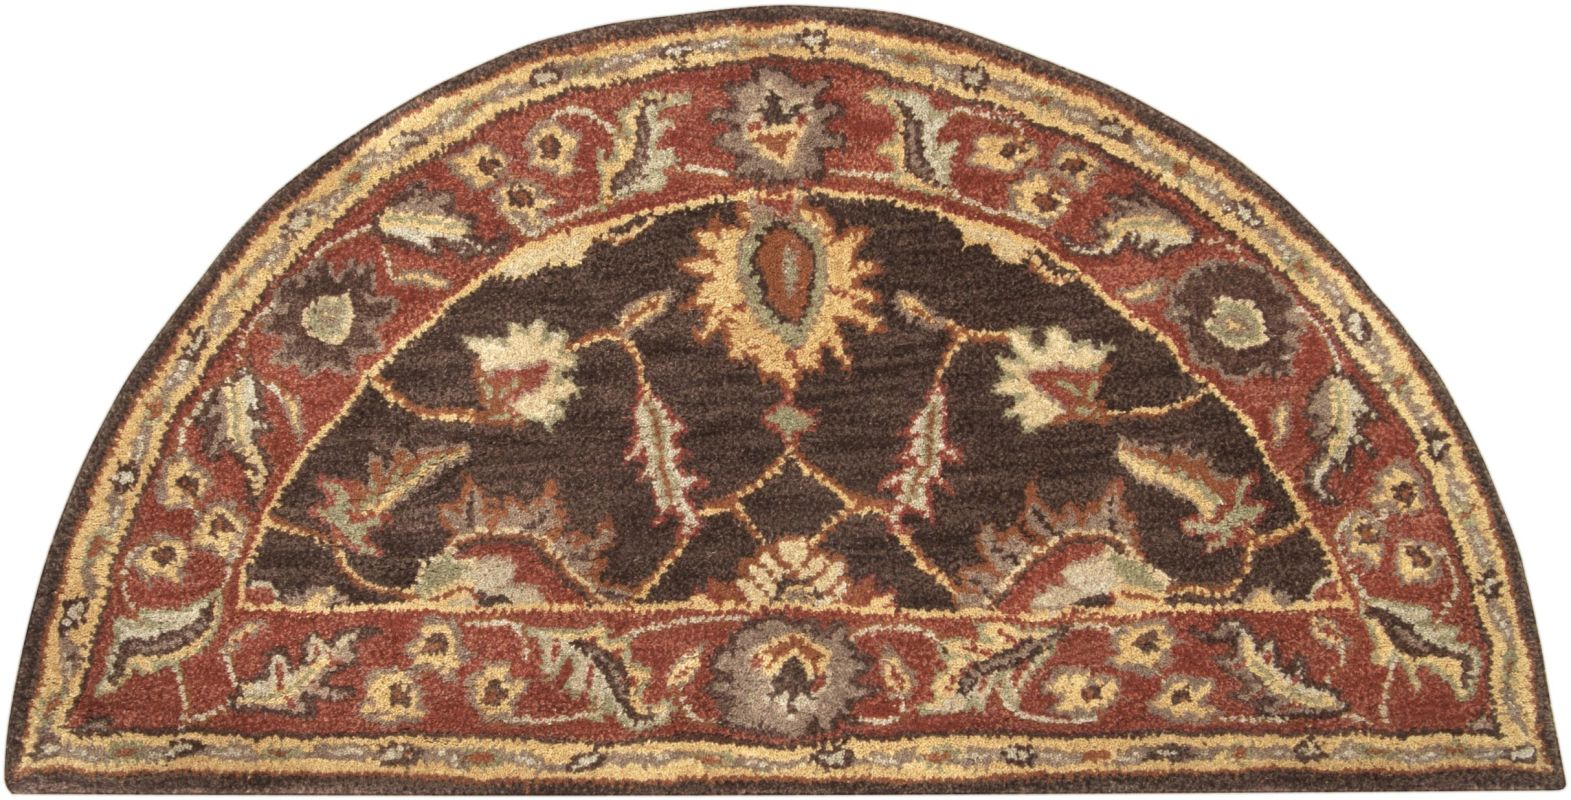 Surya CAE-1036 Caesar Hand Tufted Wool Rug Brown 2 x 4 Hearth Home